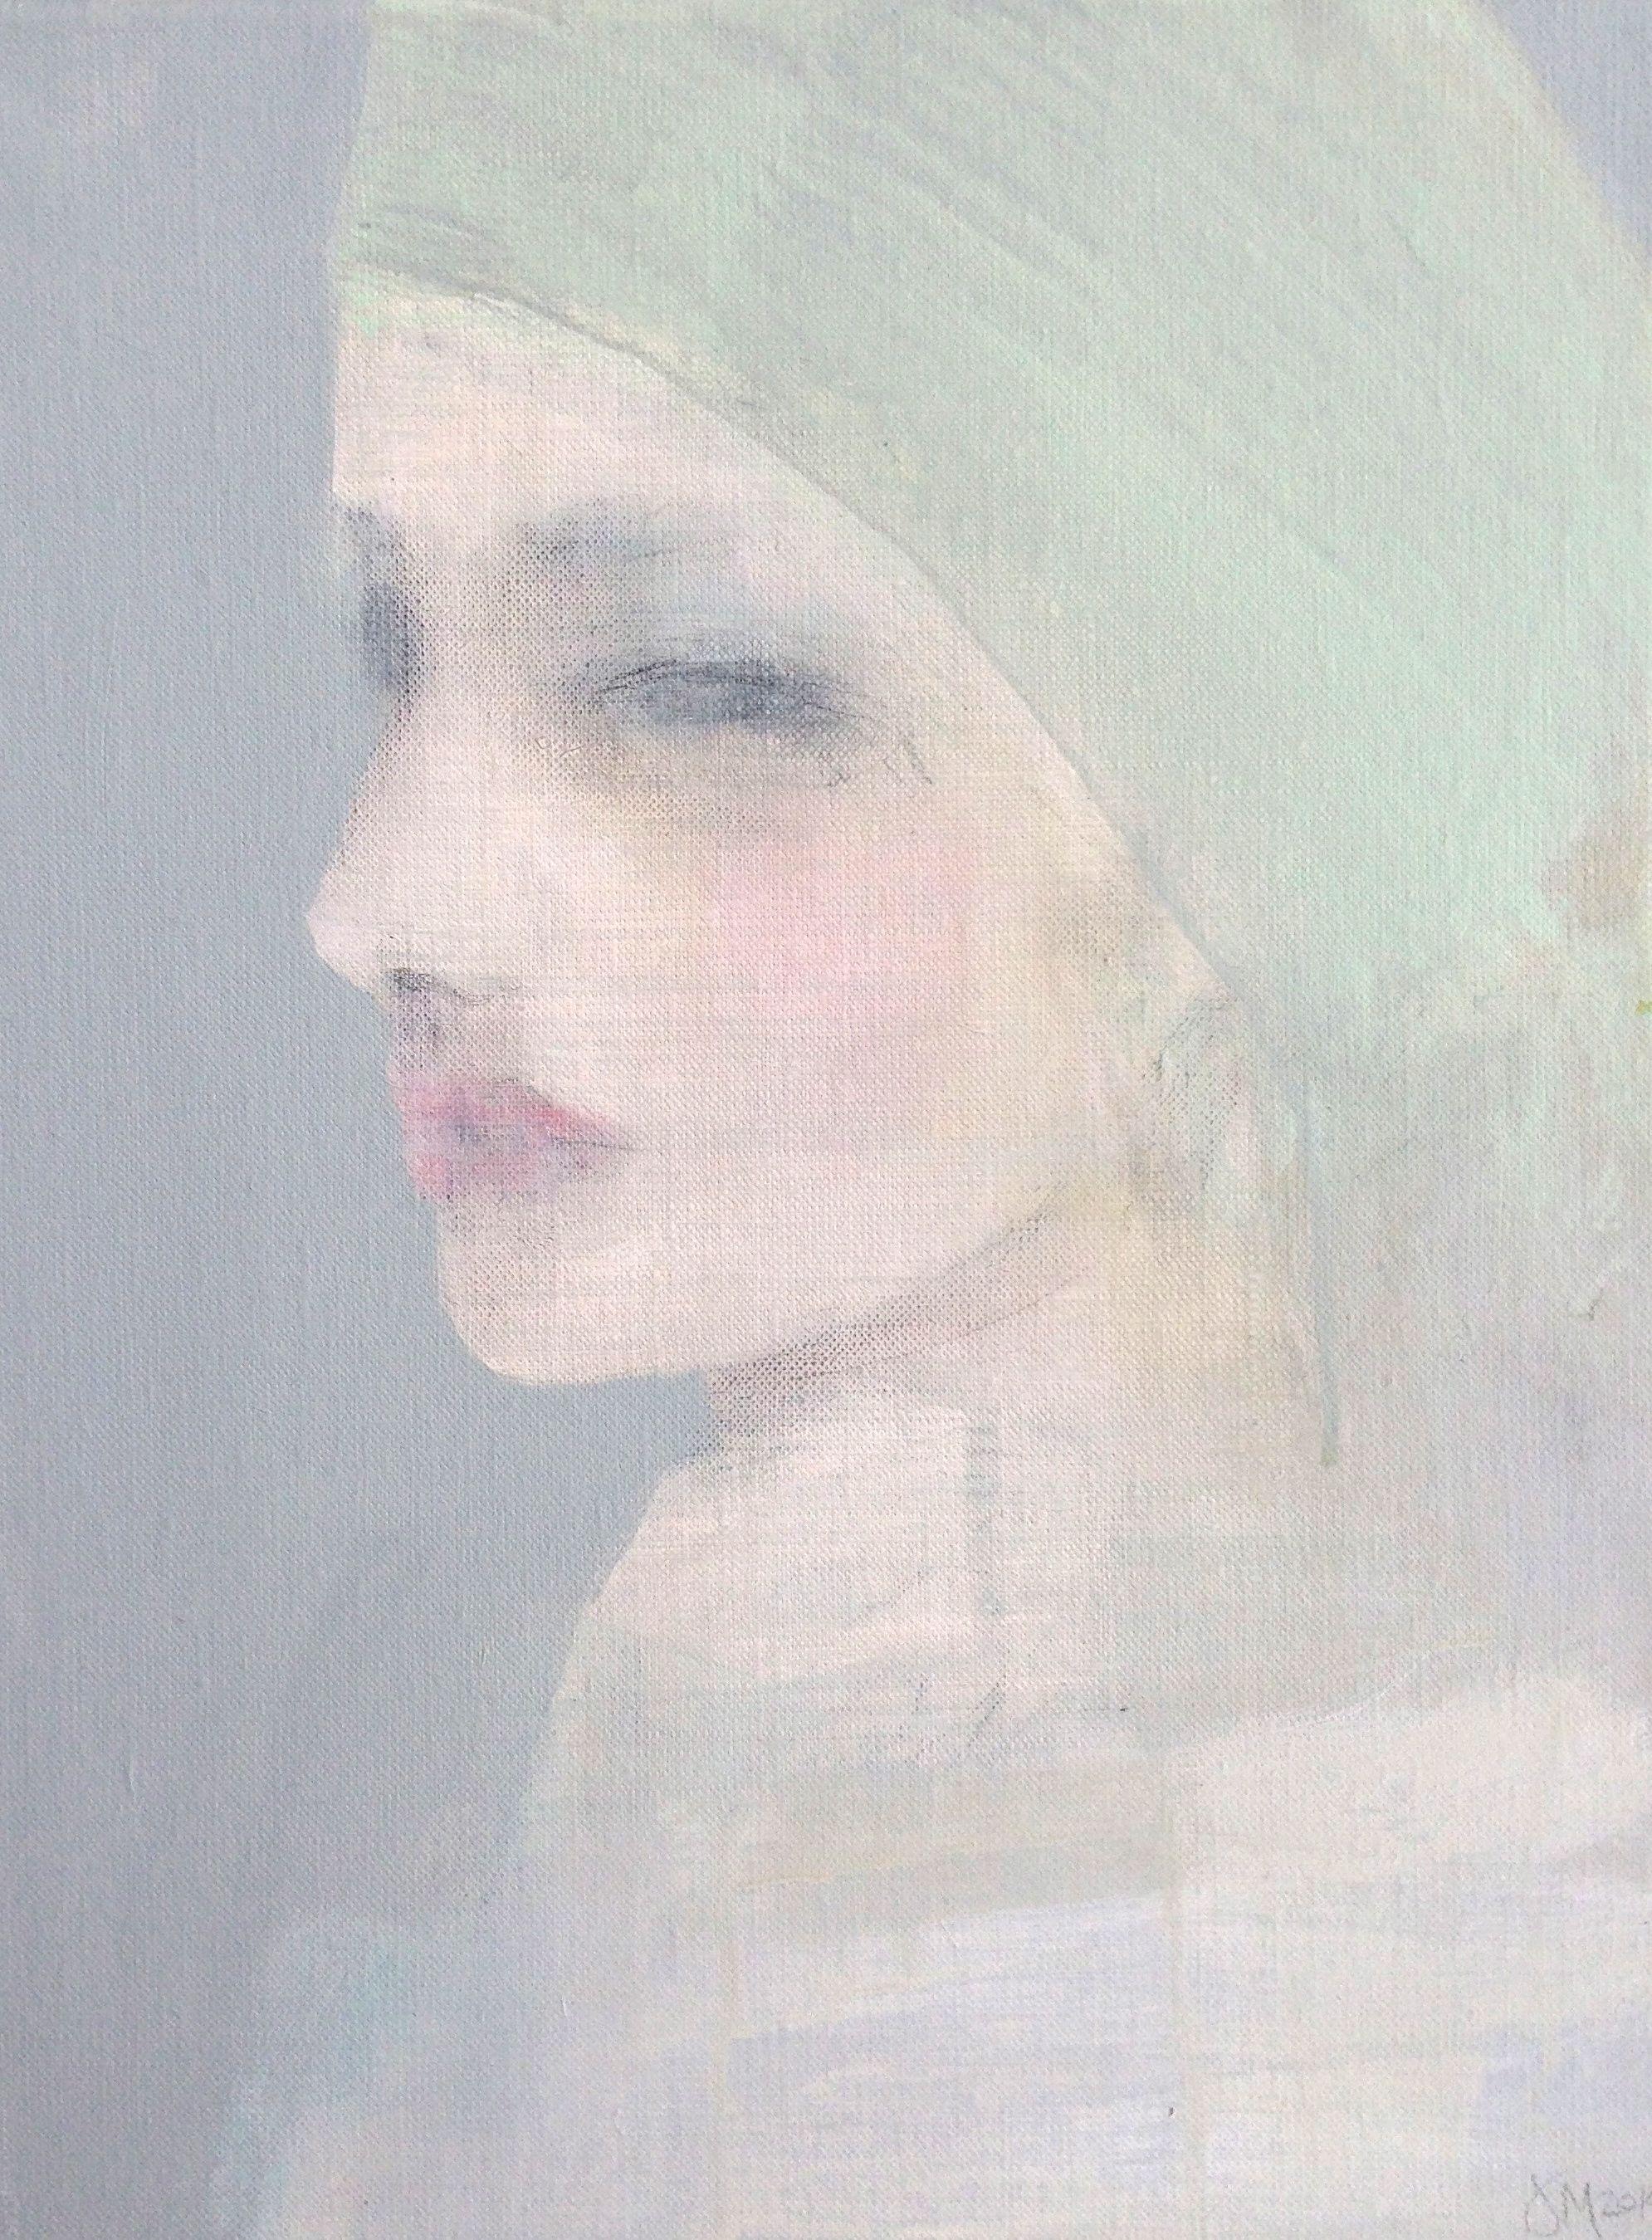 """in silk from furthest away"" by Jorunn Mulen www.almostapril.com"